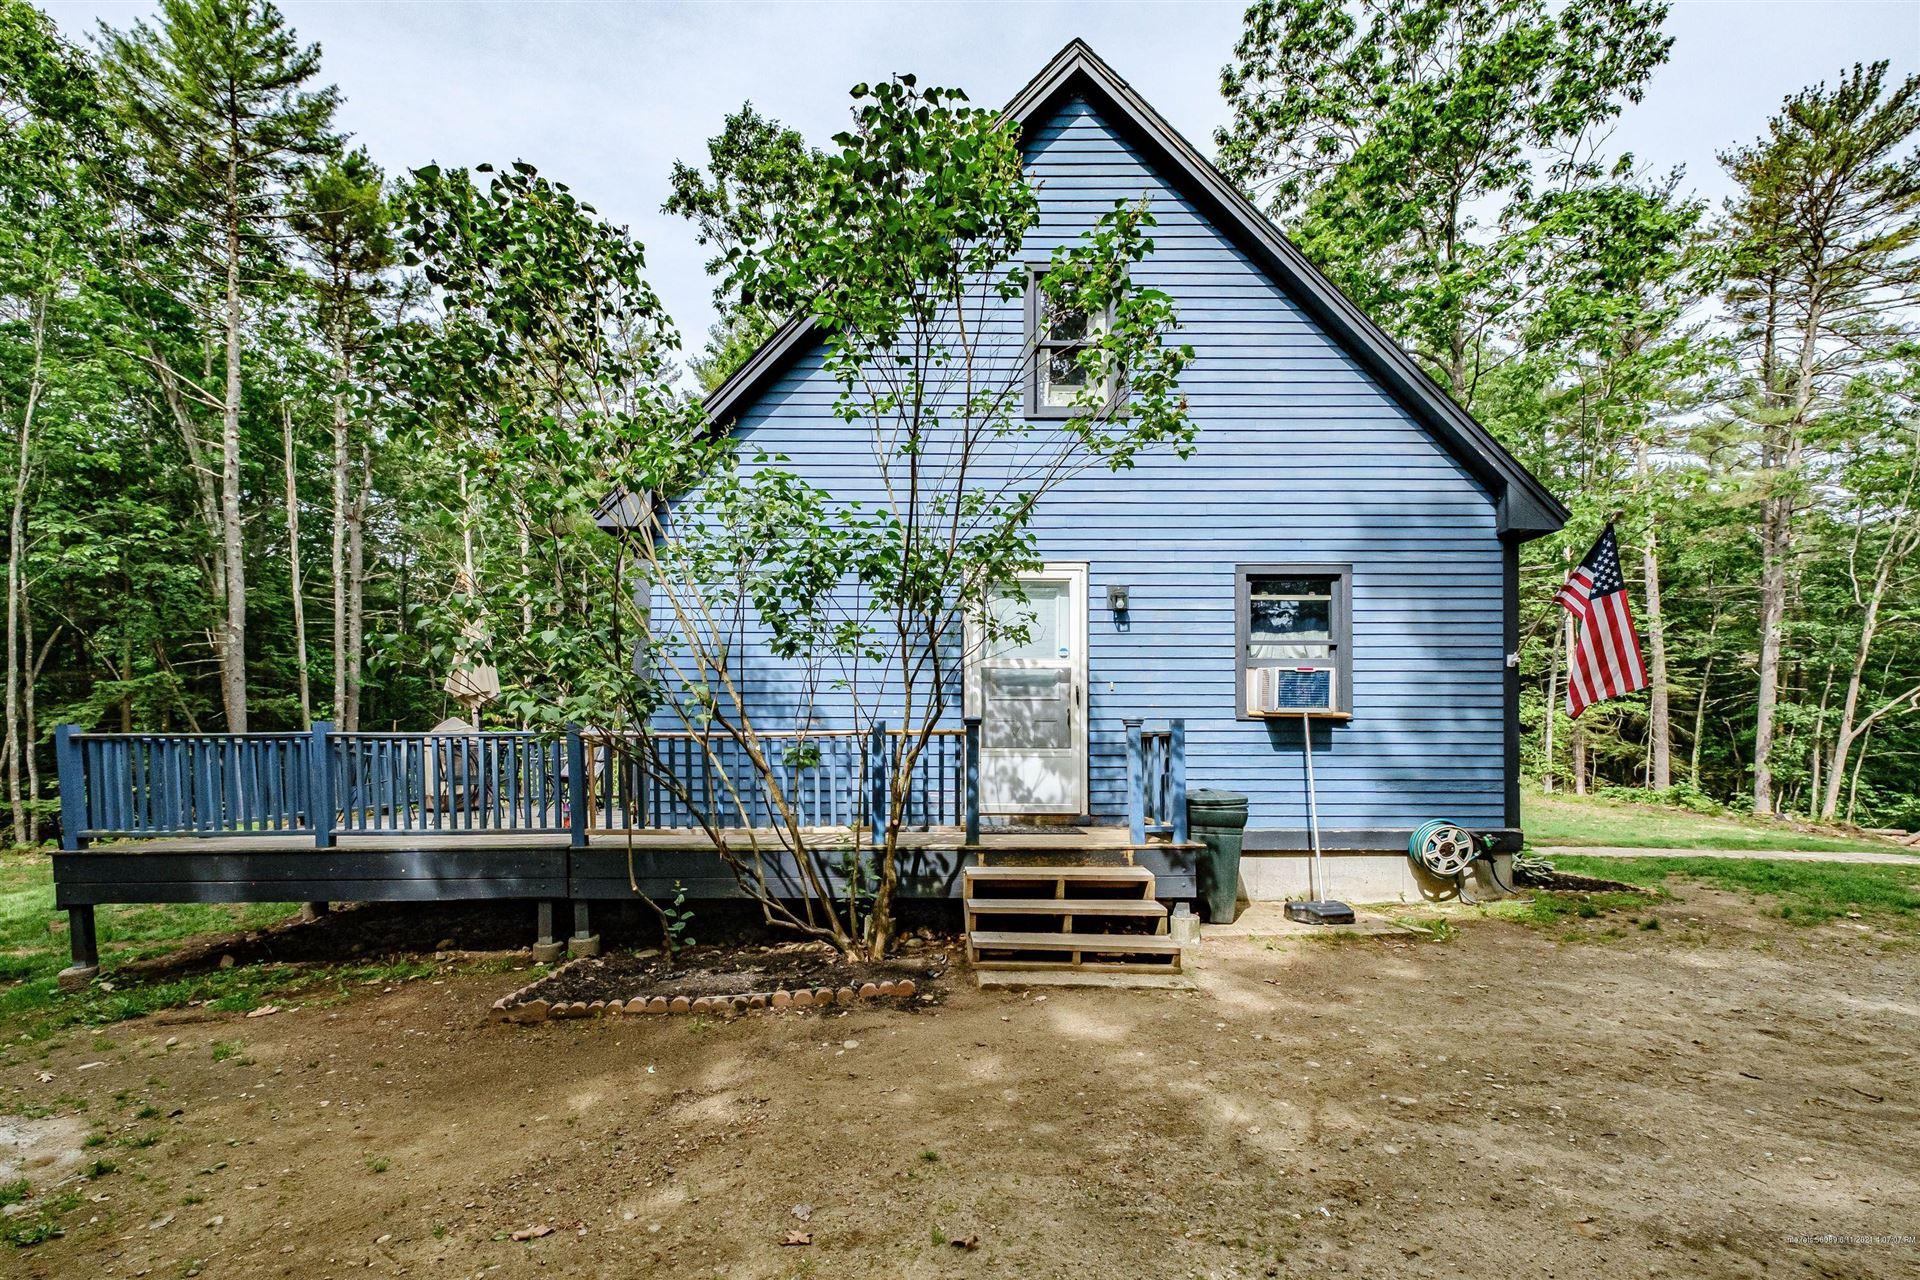 Photo of 21 Summit Drive, Waterboro, ME 04061 (MLS # 1495876)